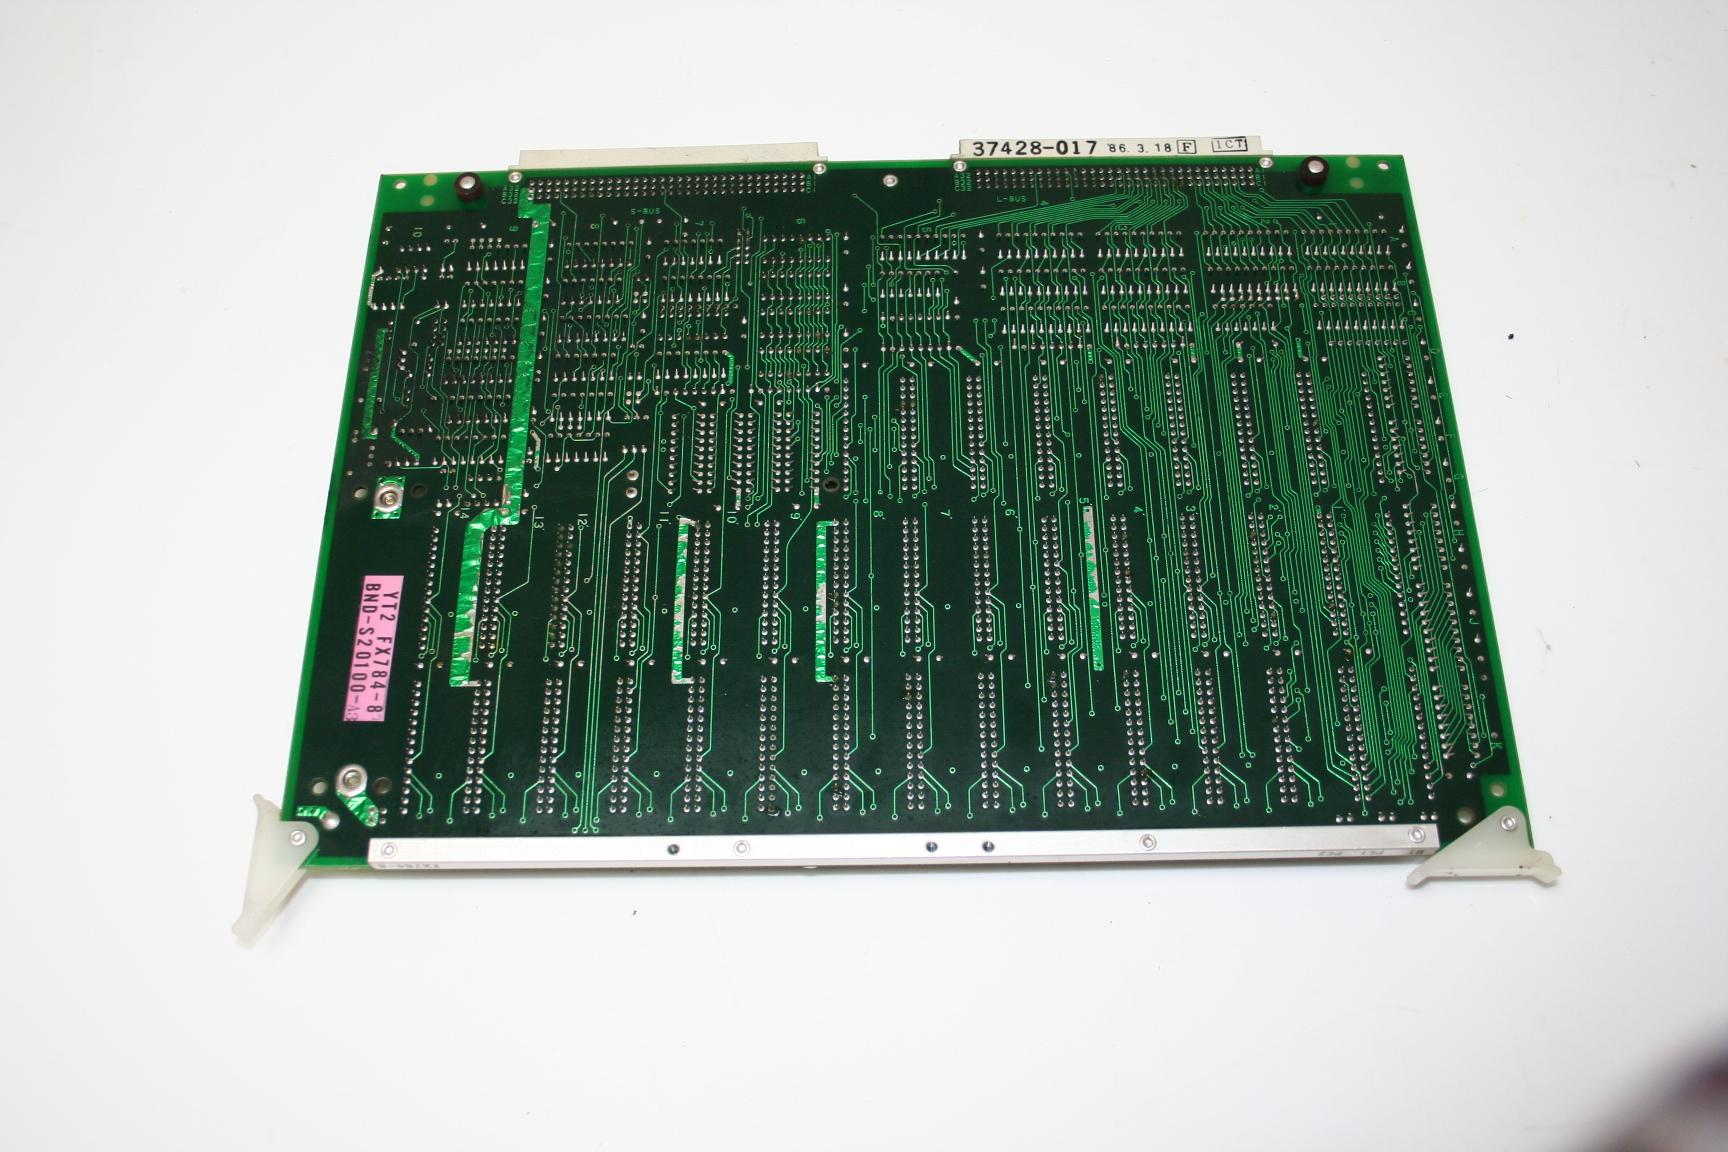 FX784B BN624A535H01 c